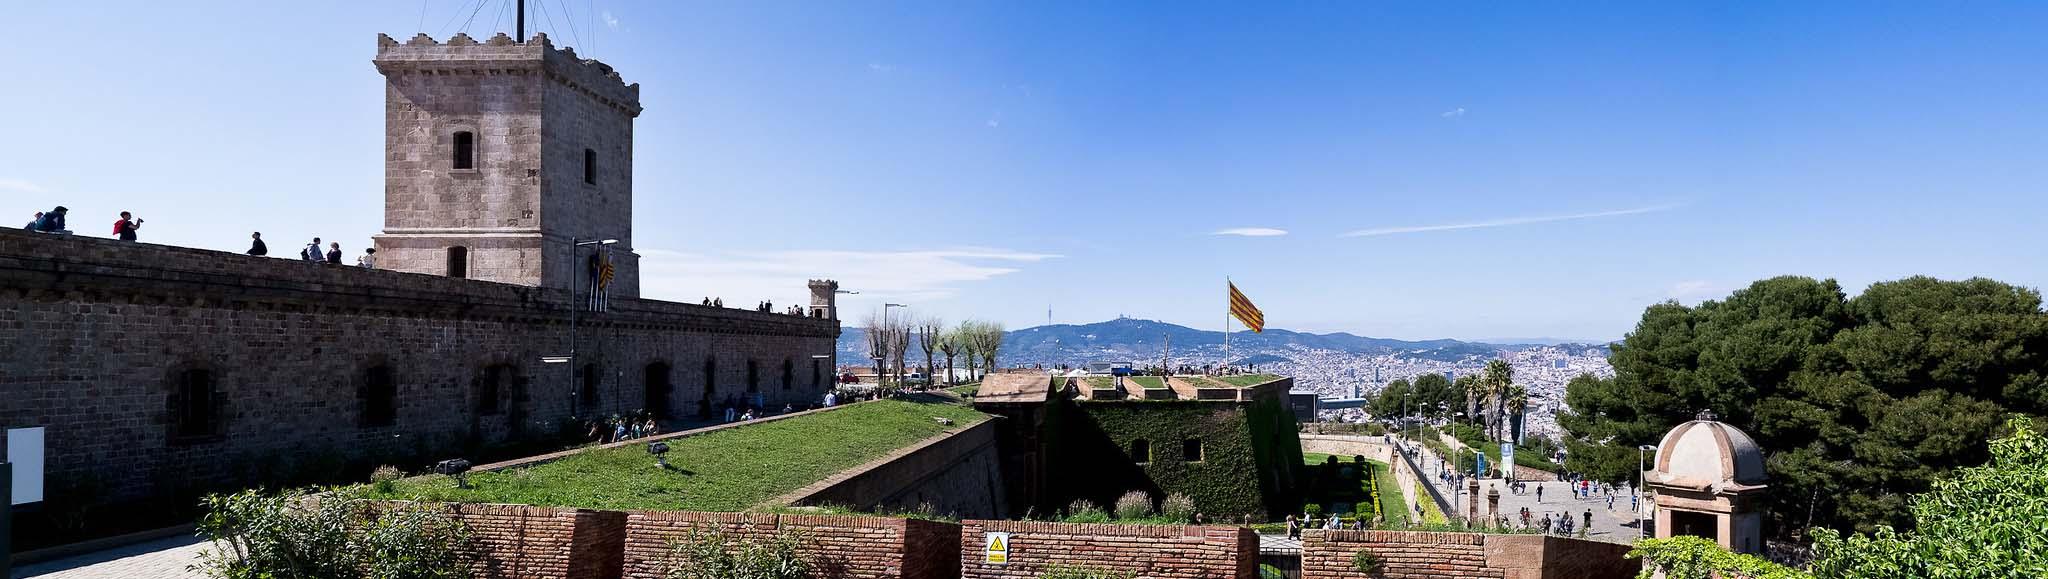 Крепость Монтжуик, Барселона